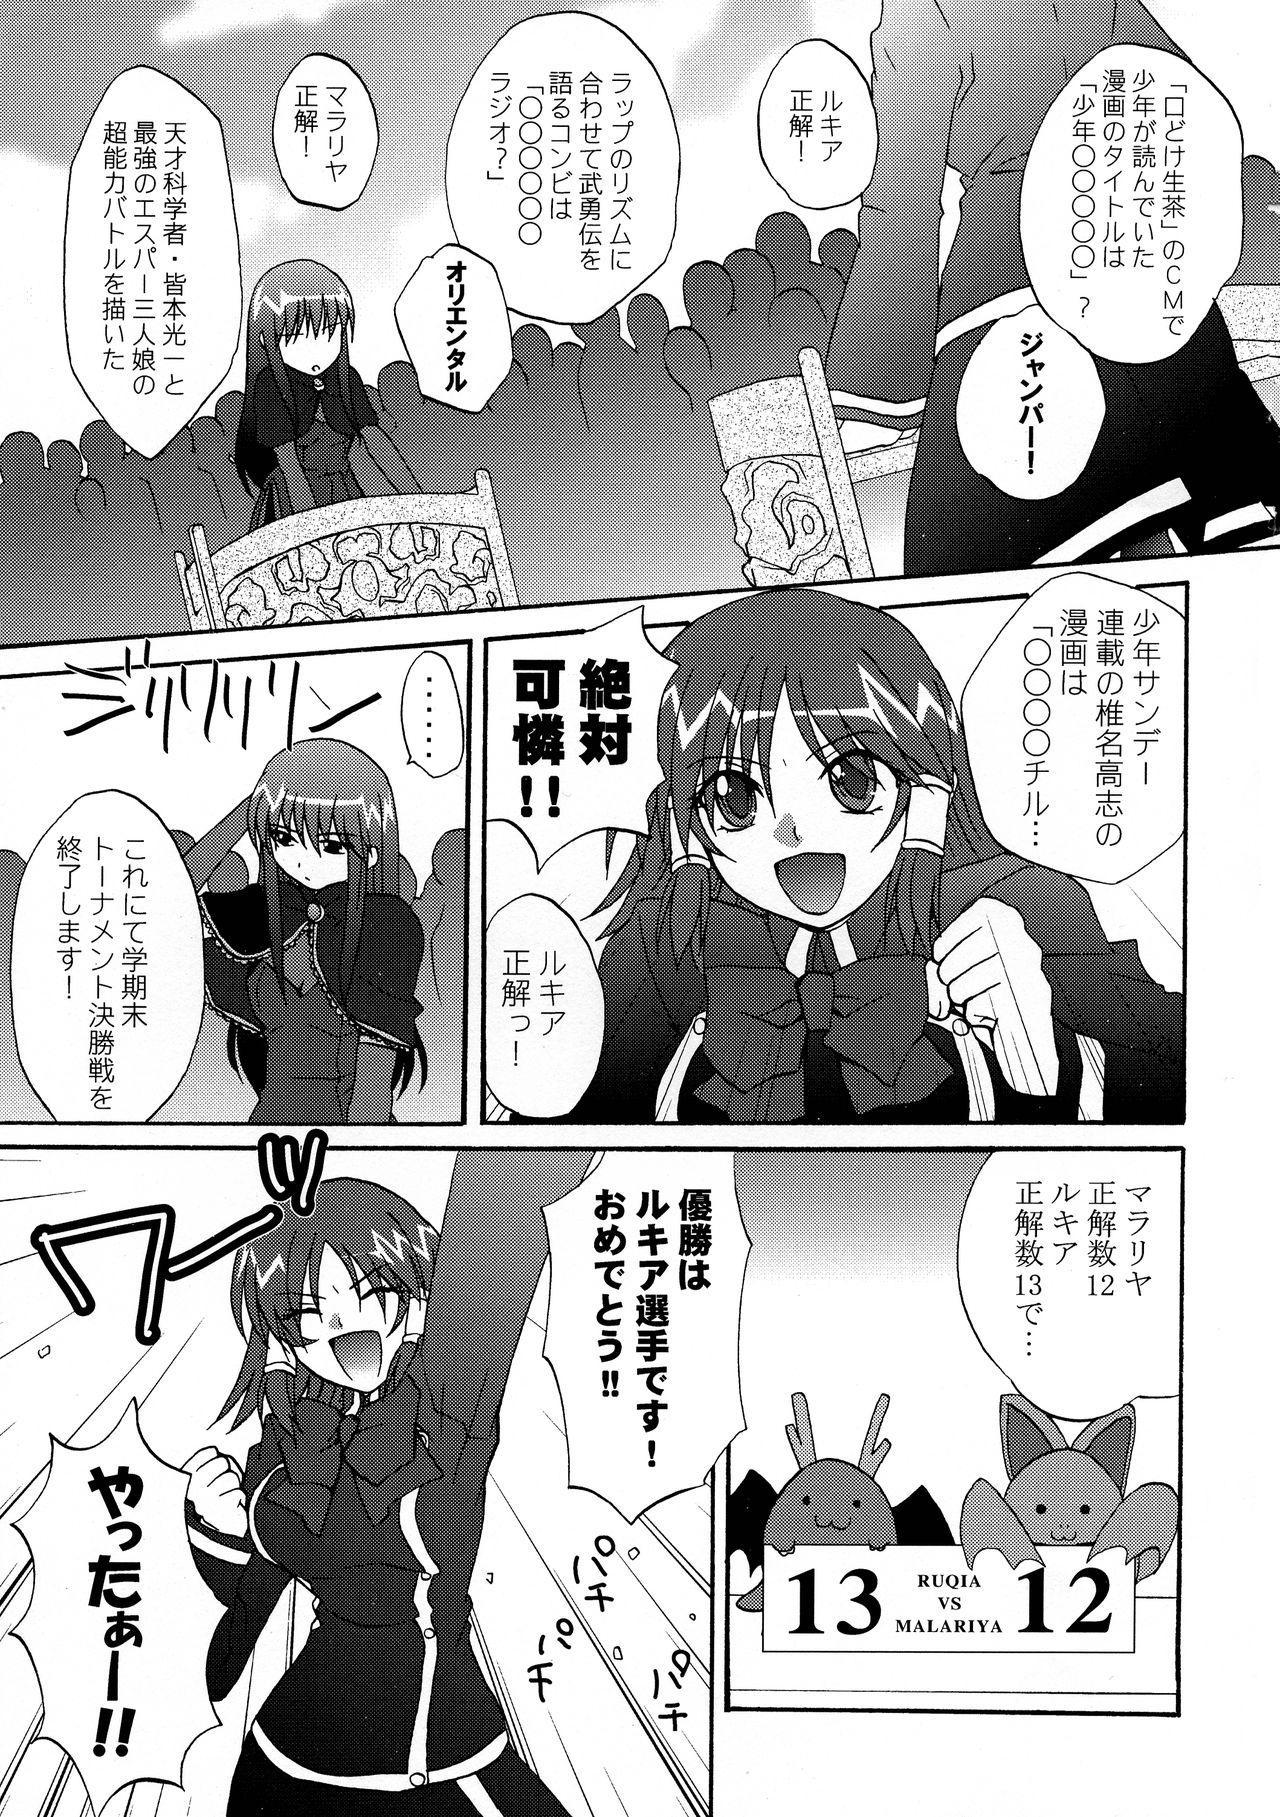 Ikenai! Miranda Sensei Fever 4